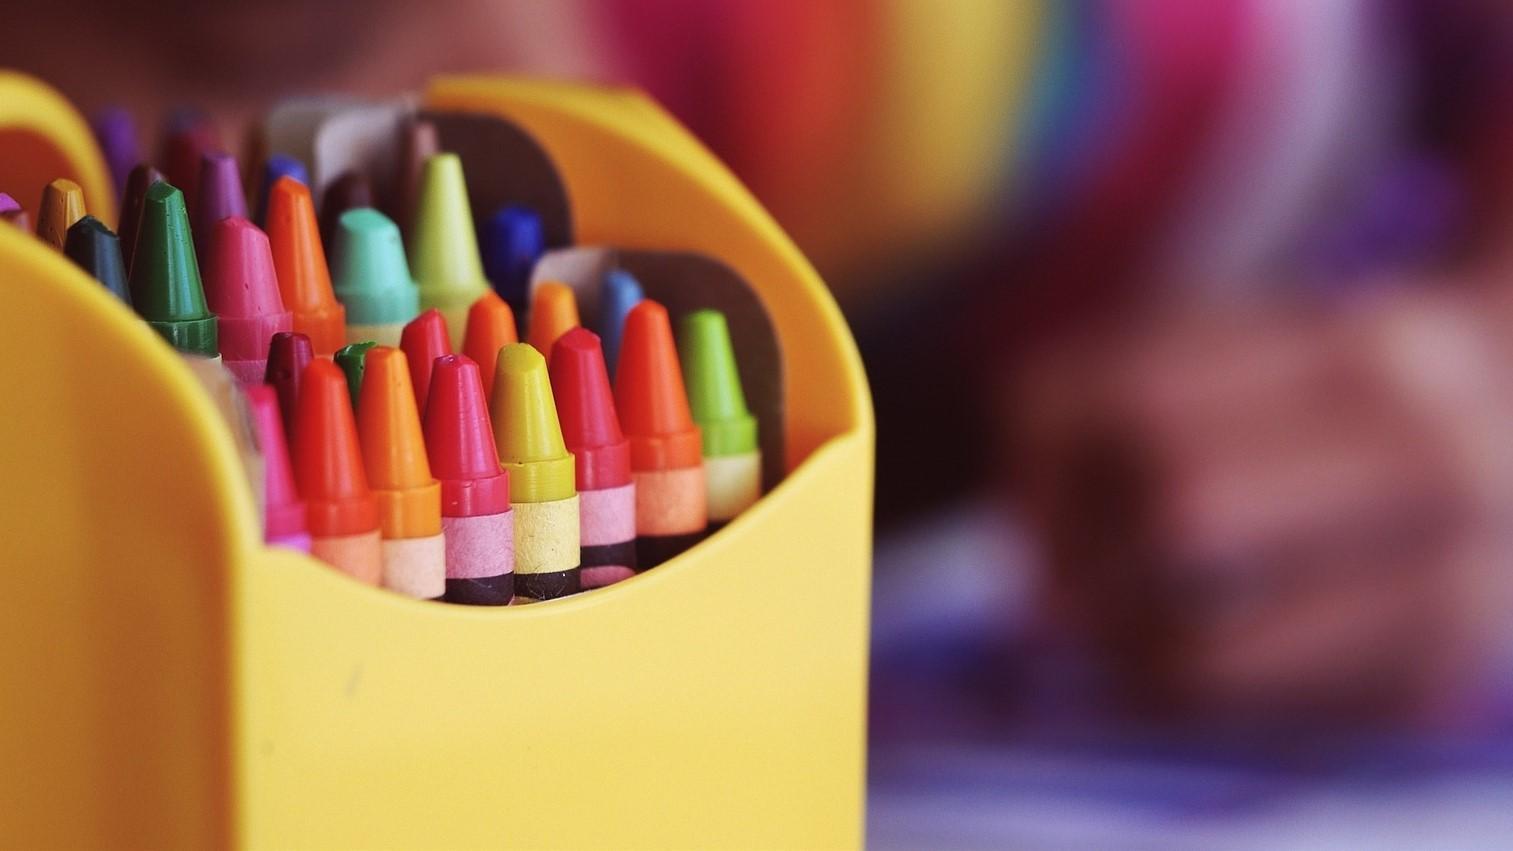 crayons 1209804 1920